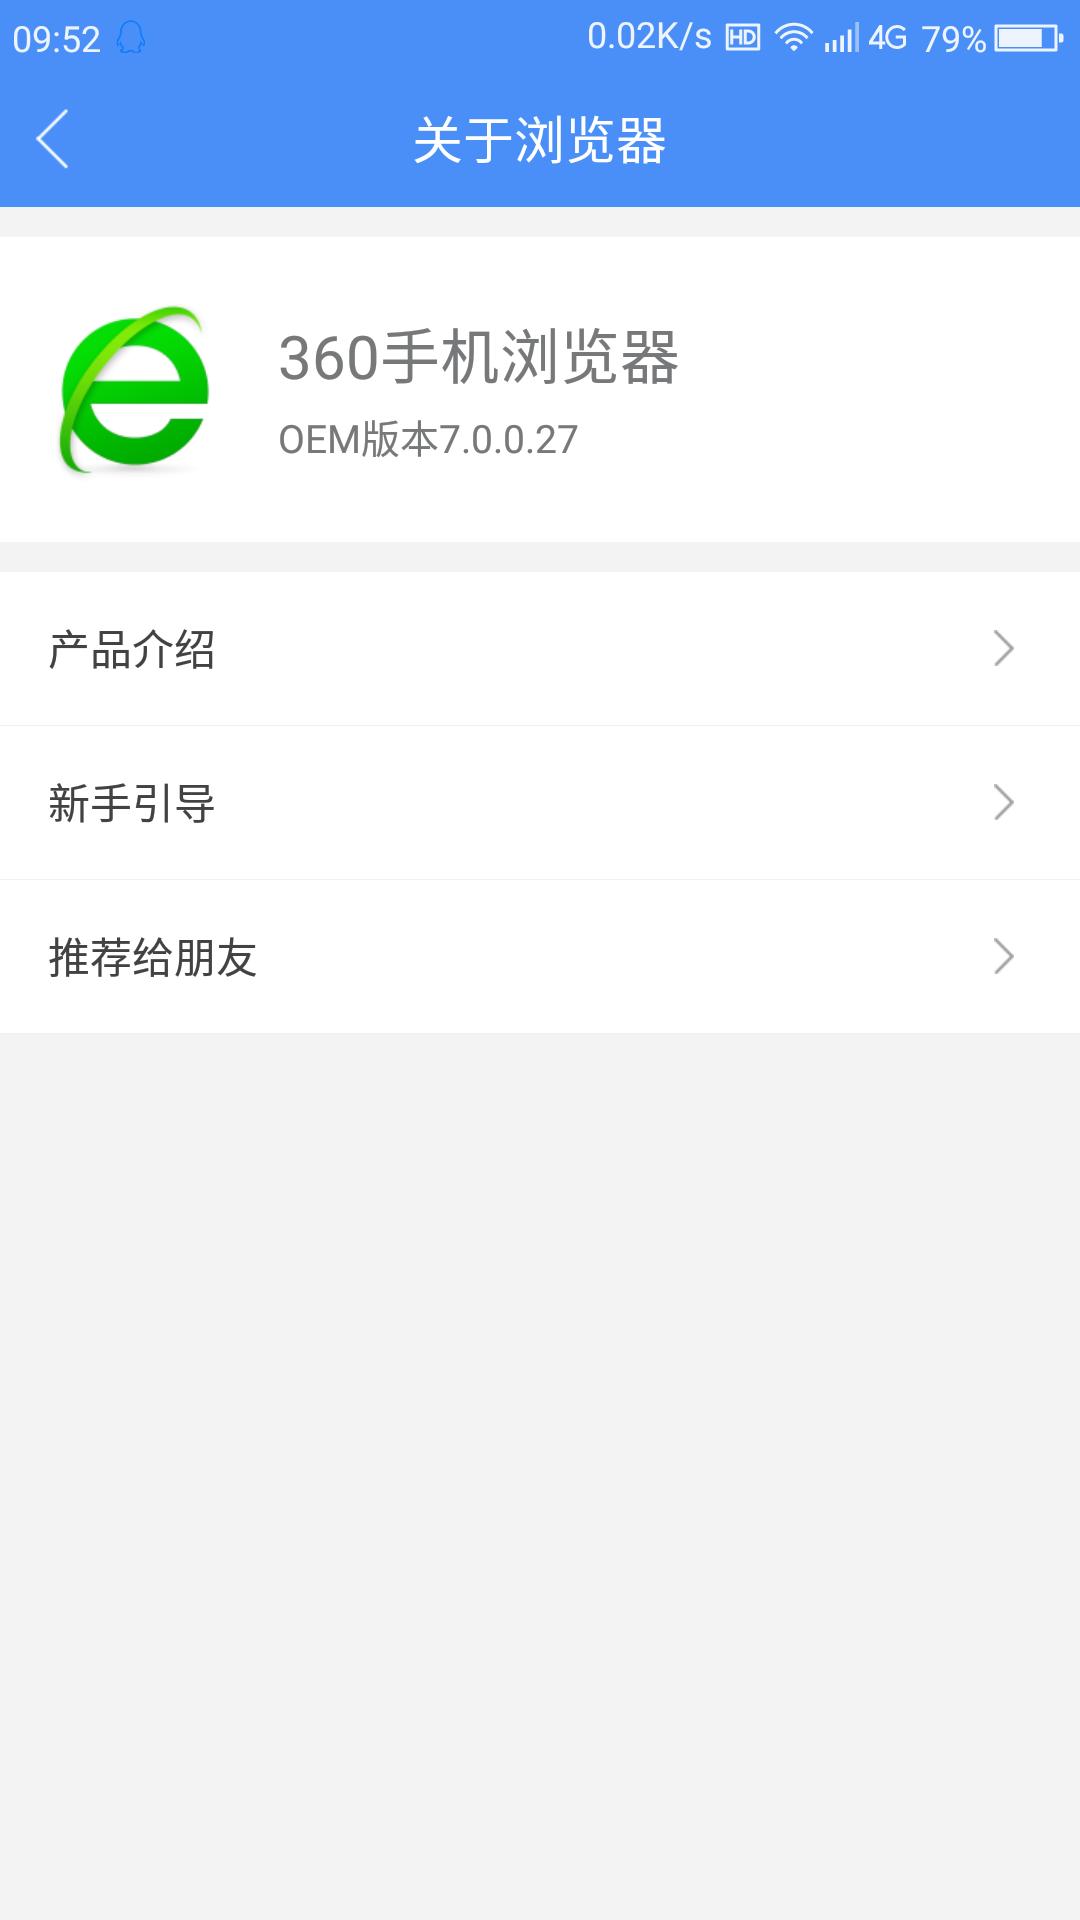 Screenshot_2016-08-27-09-52-25.png